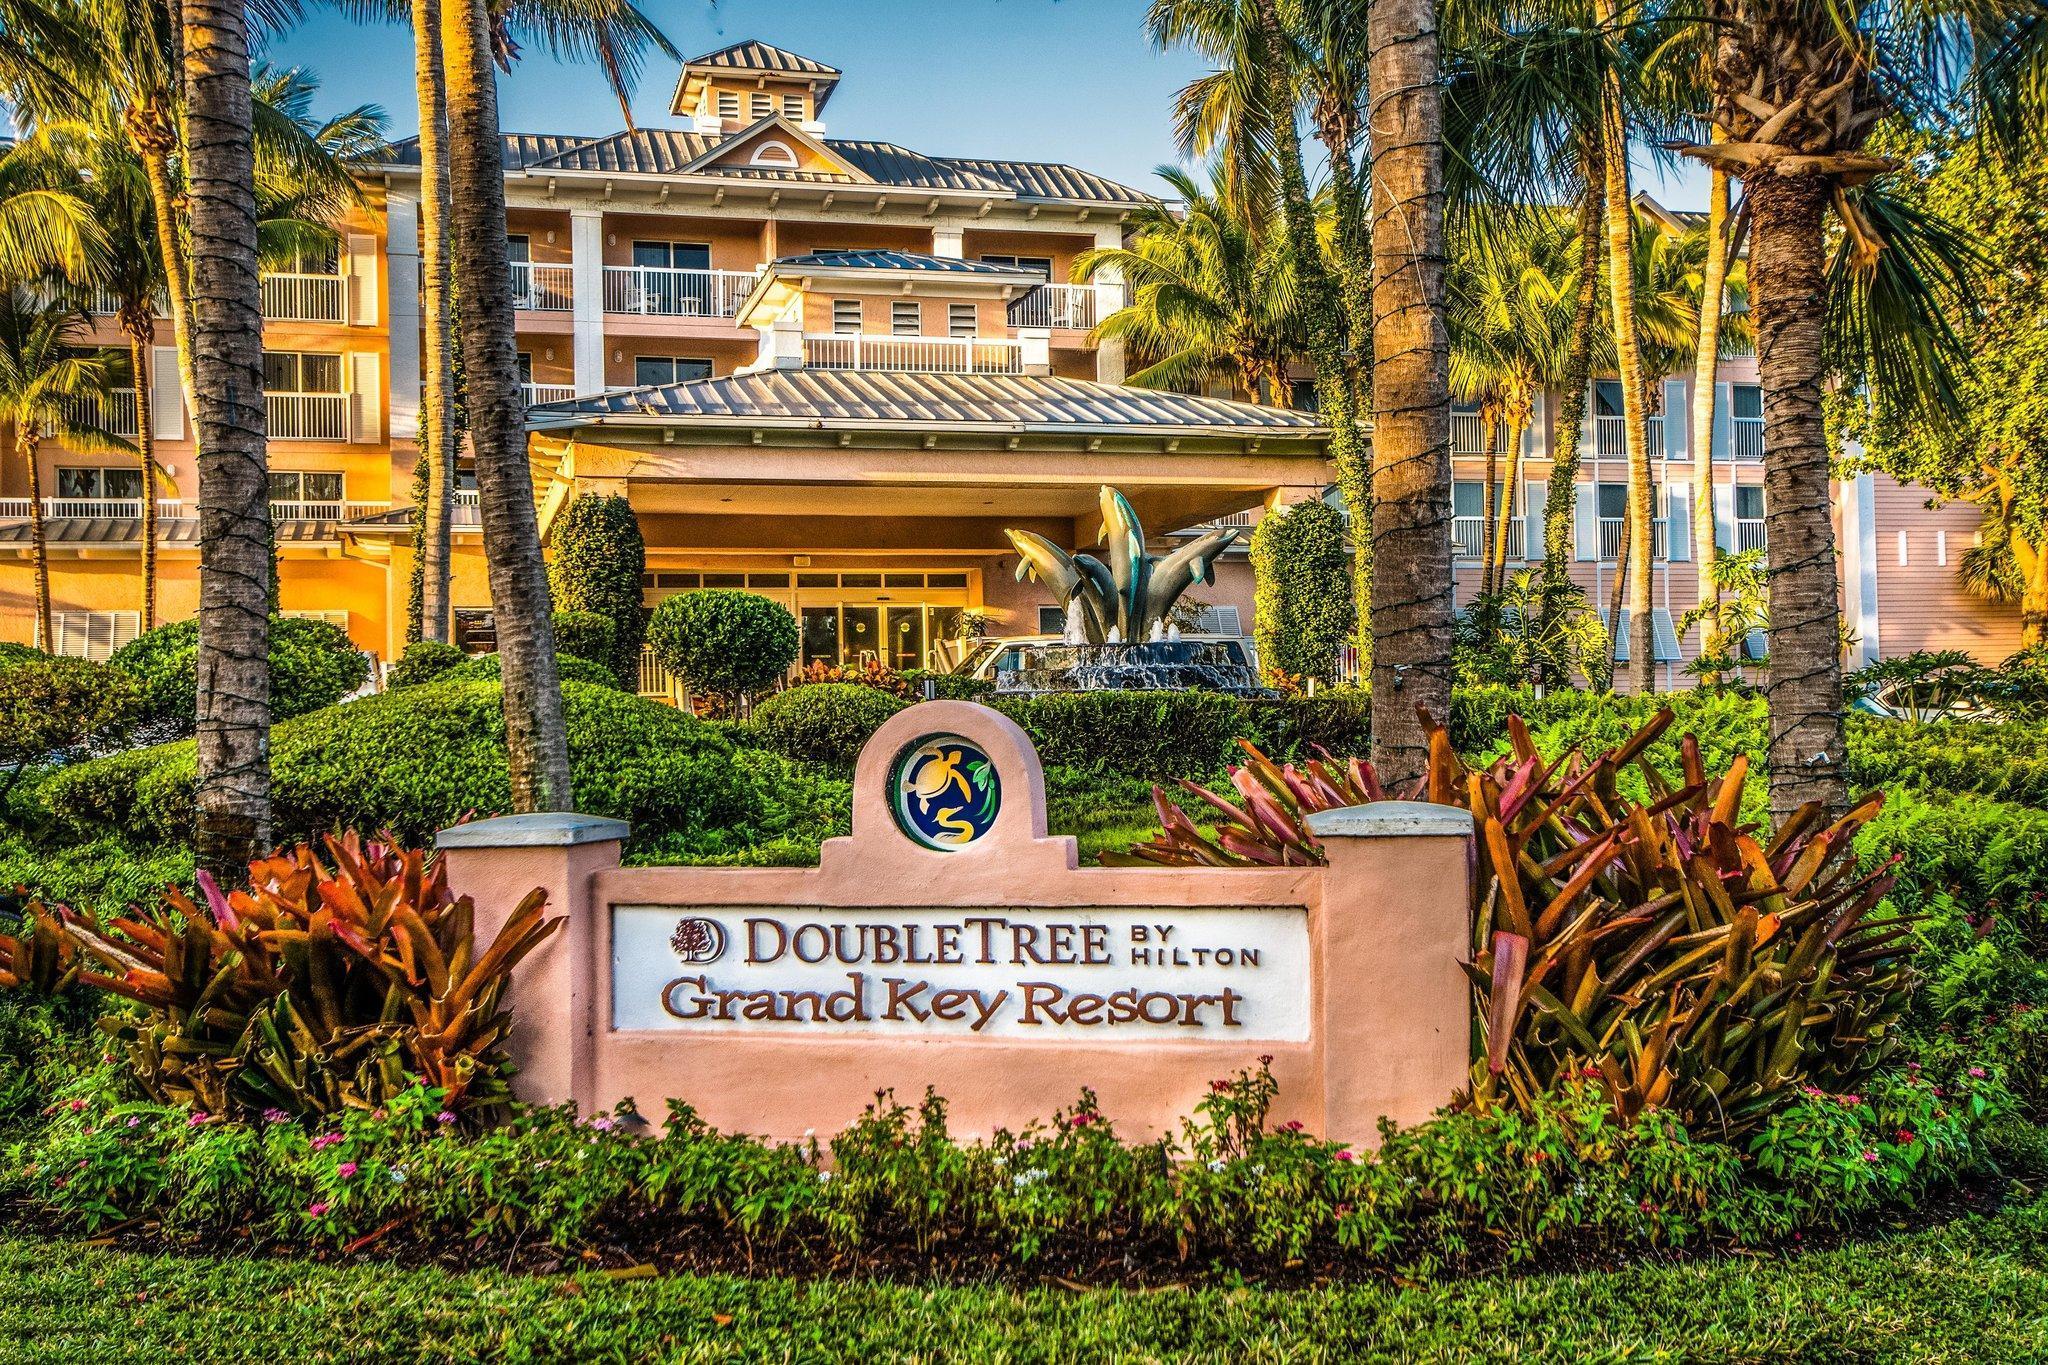 DoubleTree by Hilton Key West Grand Key Resort image